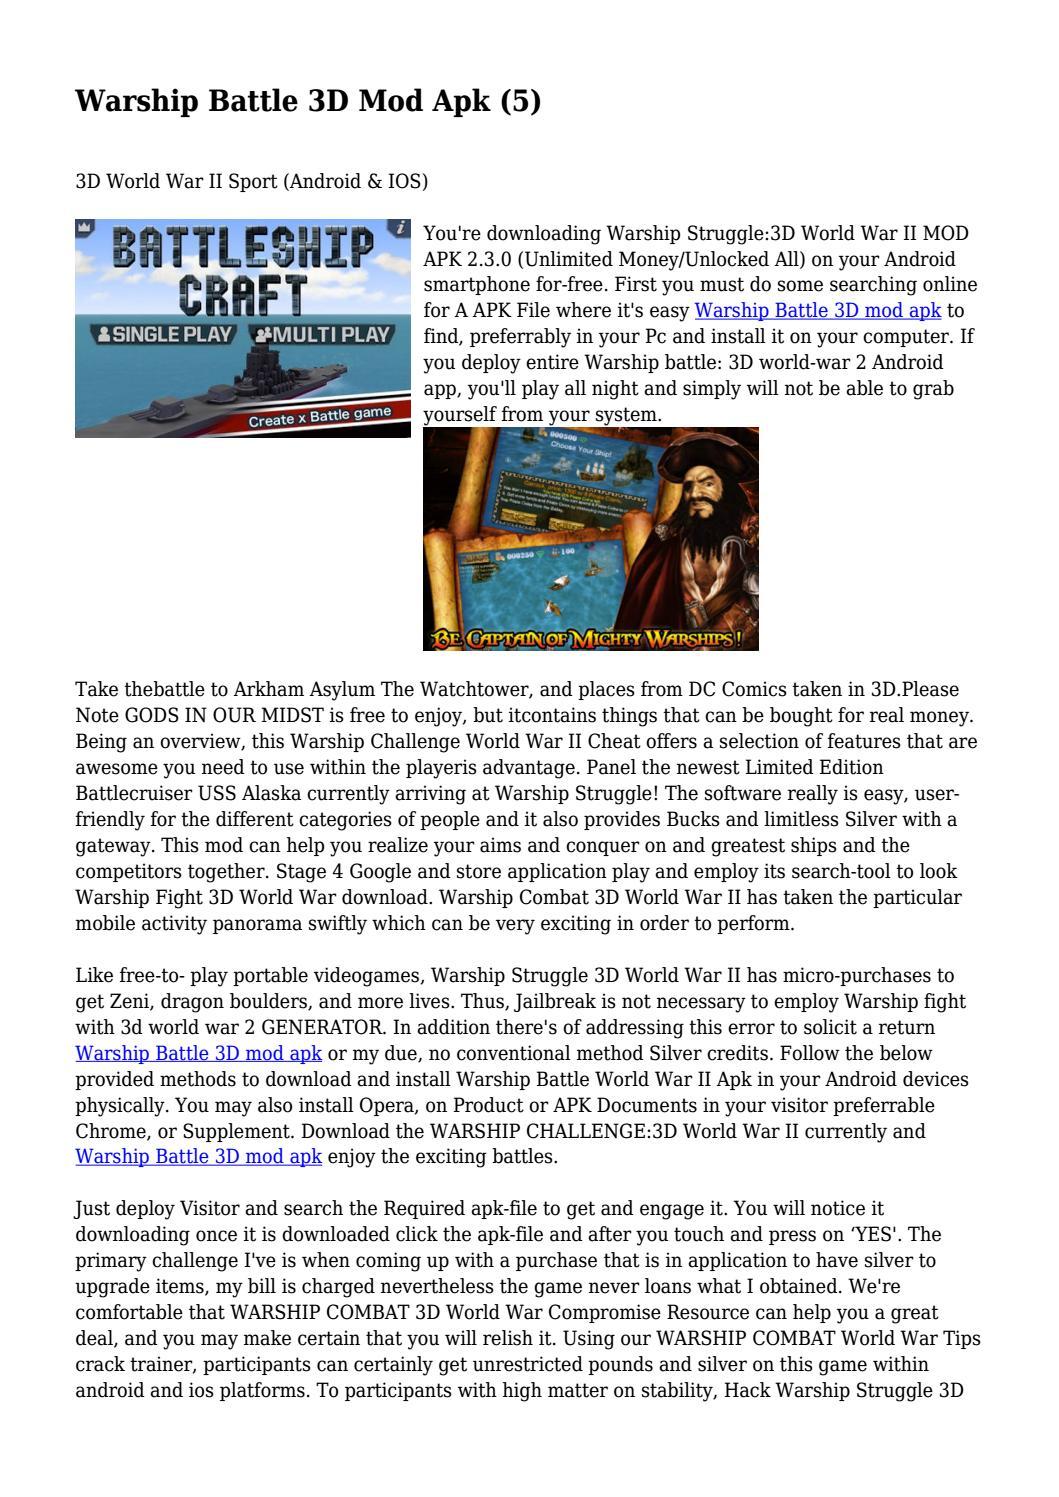 Warship Battle 3D Mod Apk (5)    by adam8myers2 - issuu